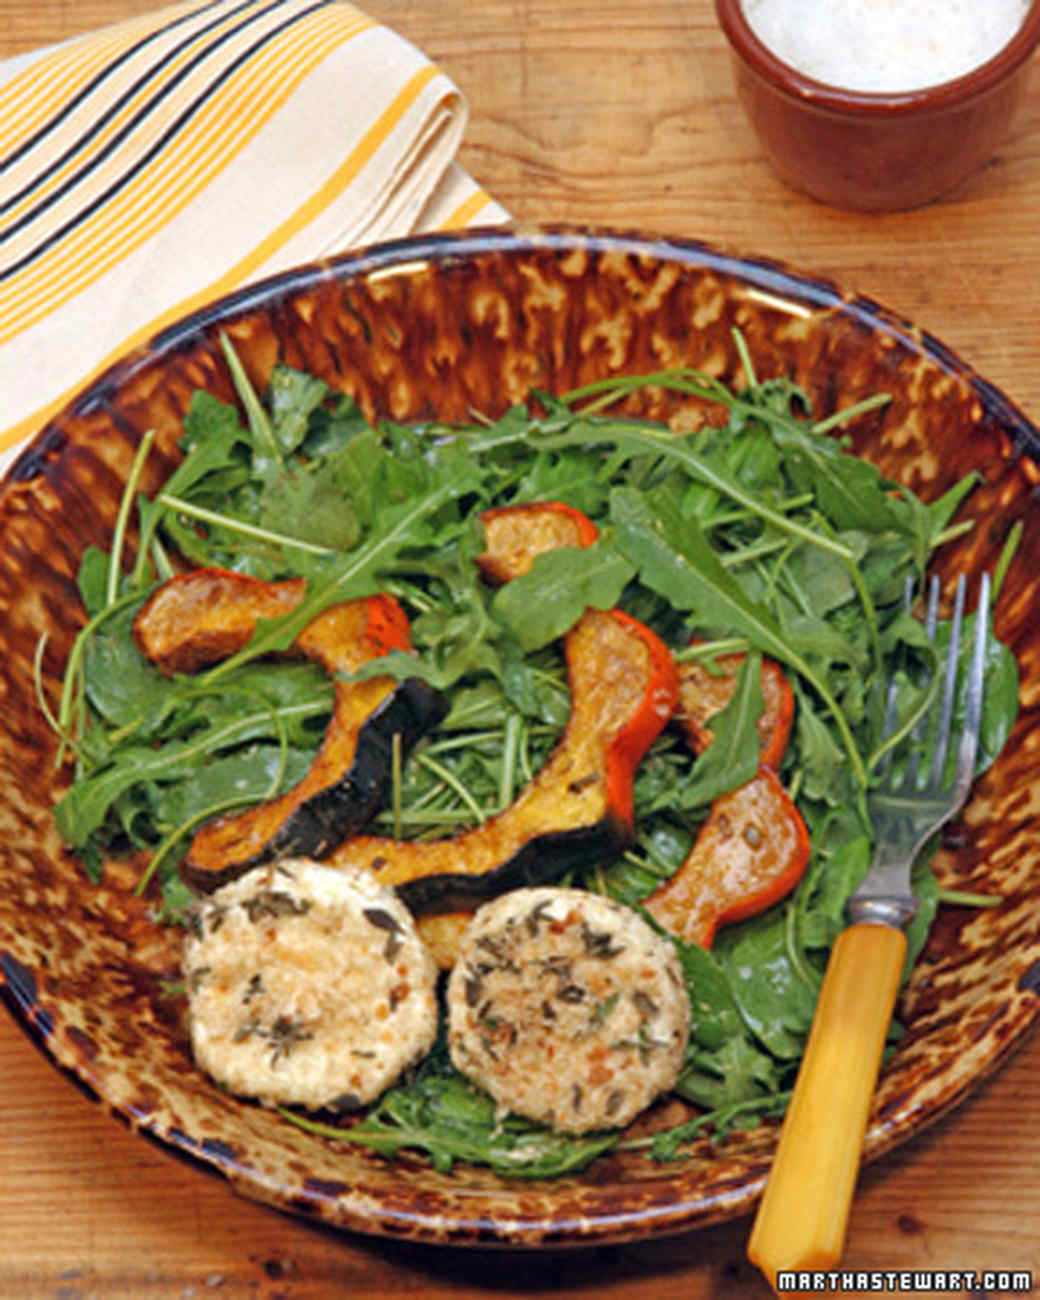 Balsamic Vinaigrette for Roasted Acorn Squash Salad